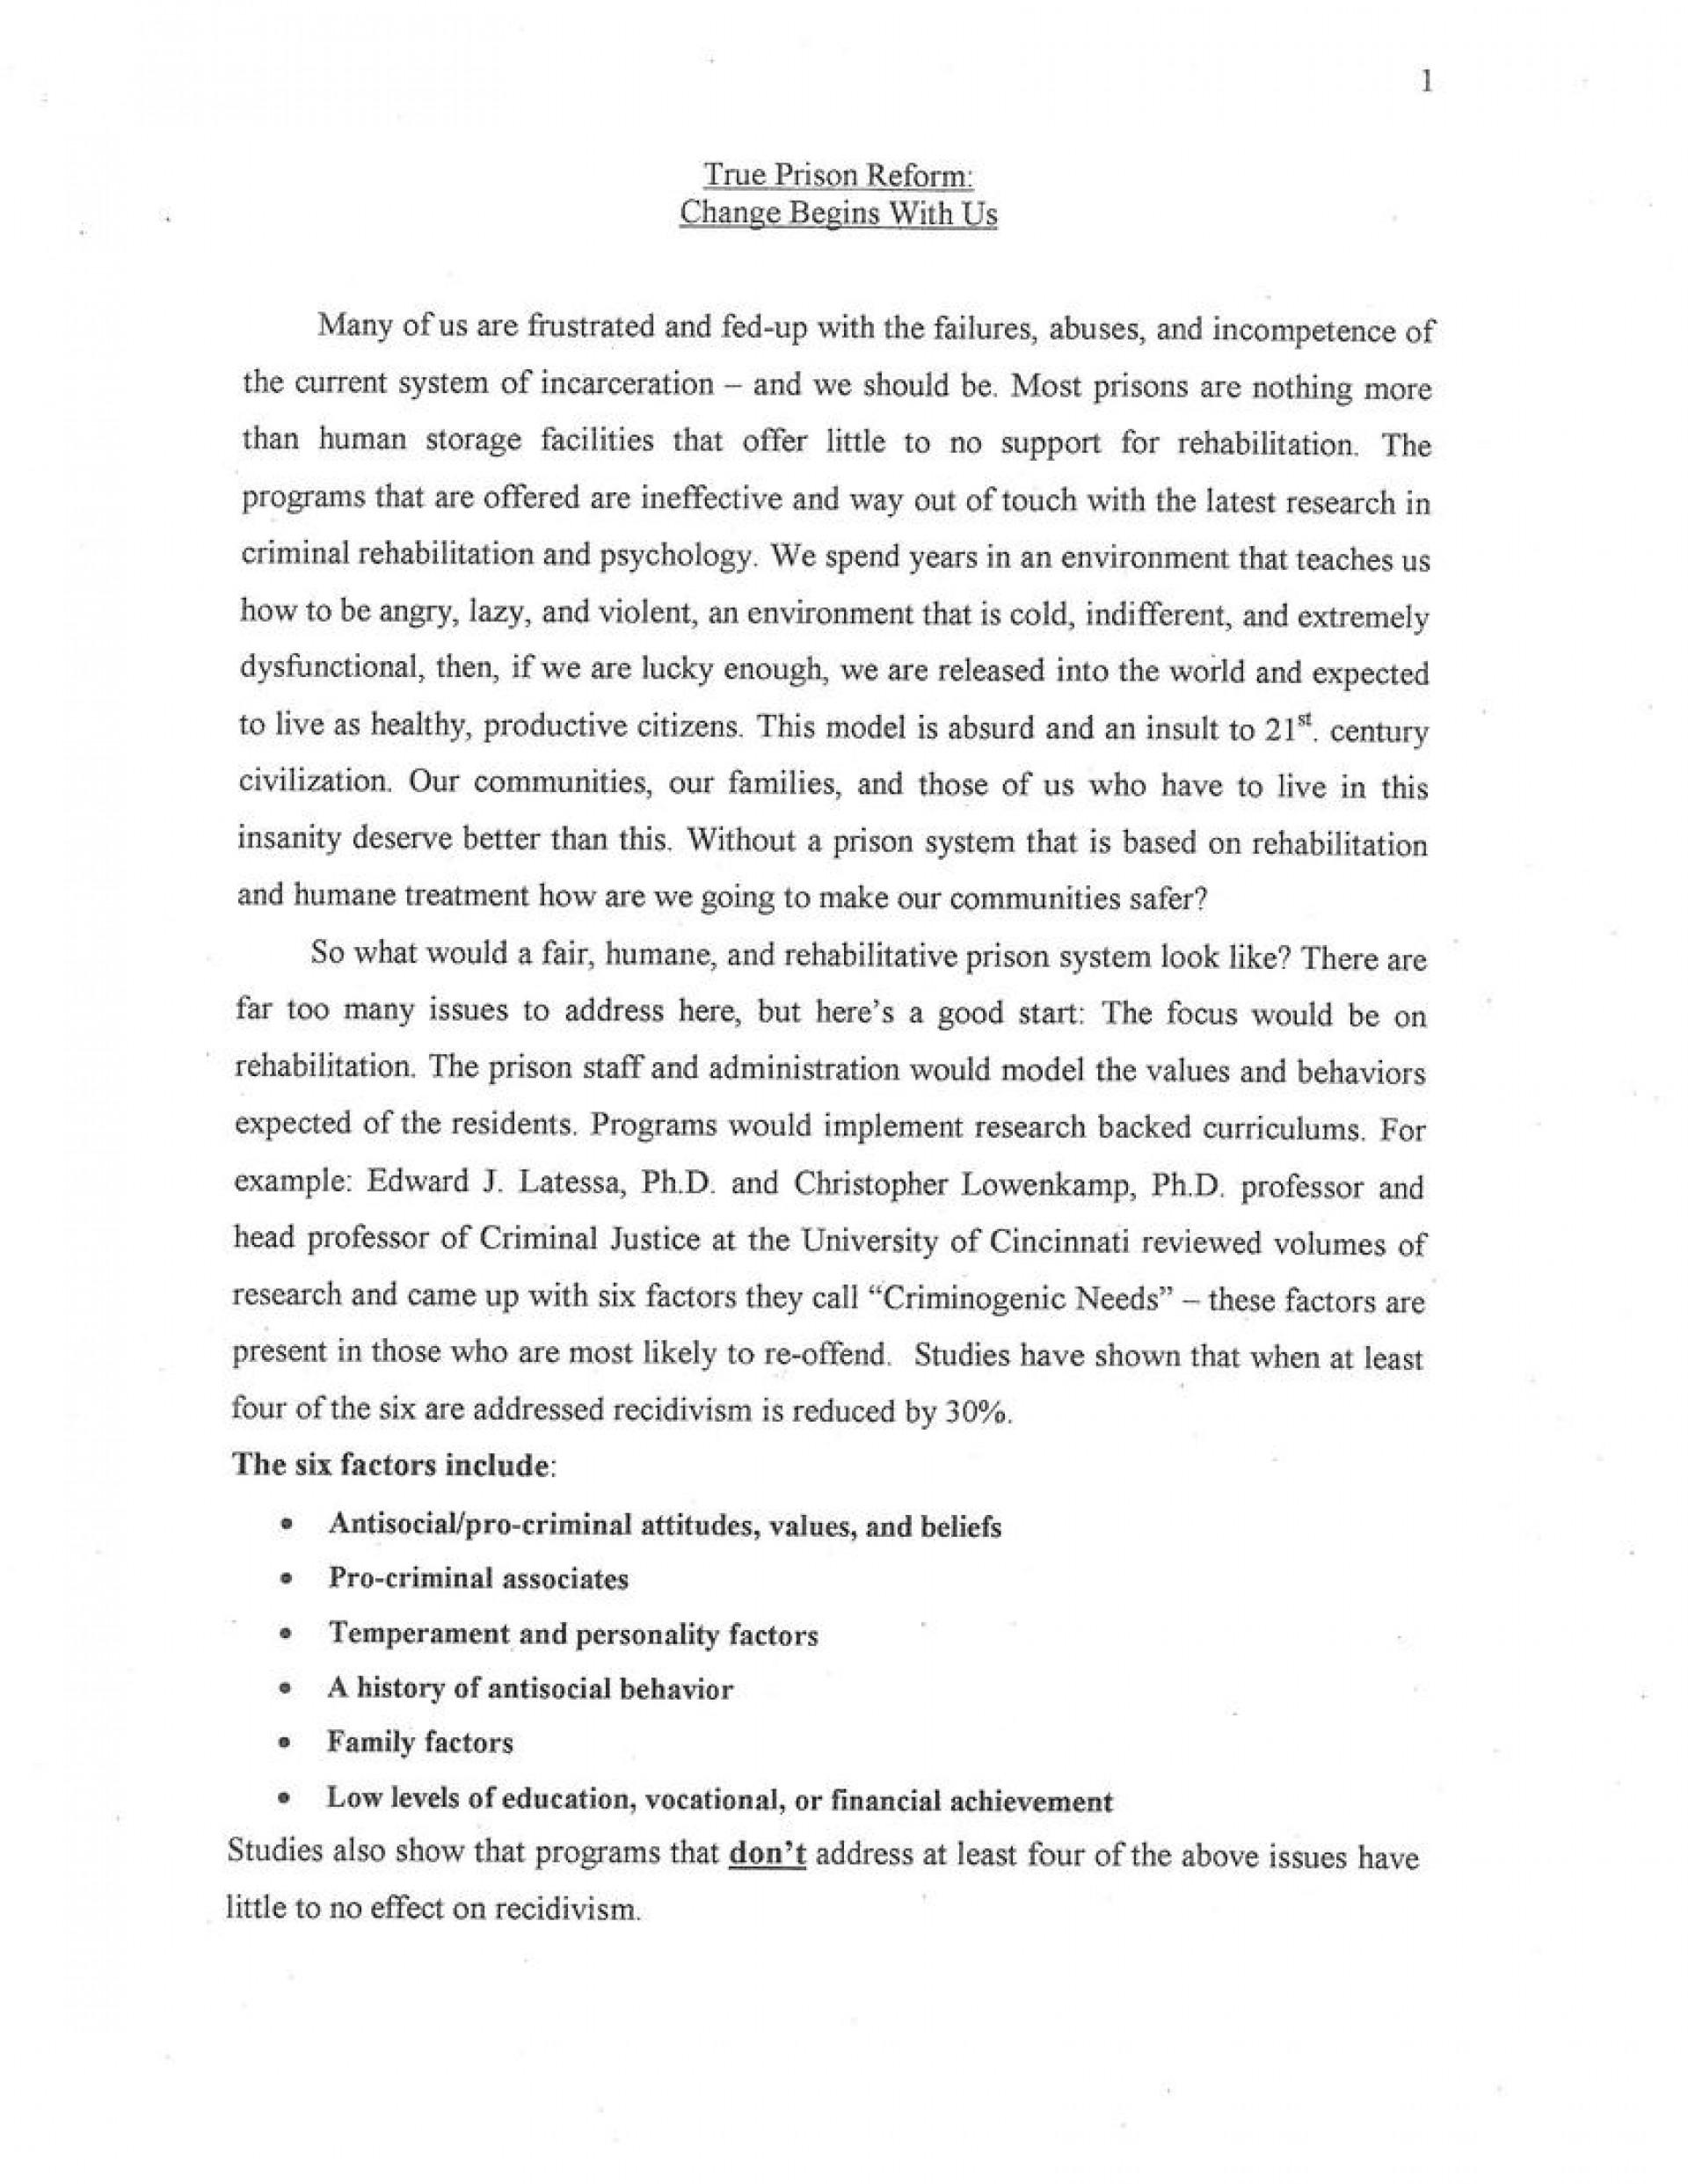 Masters essay editing service uk